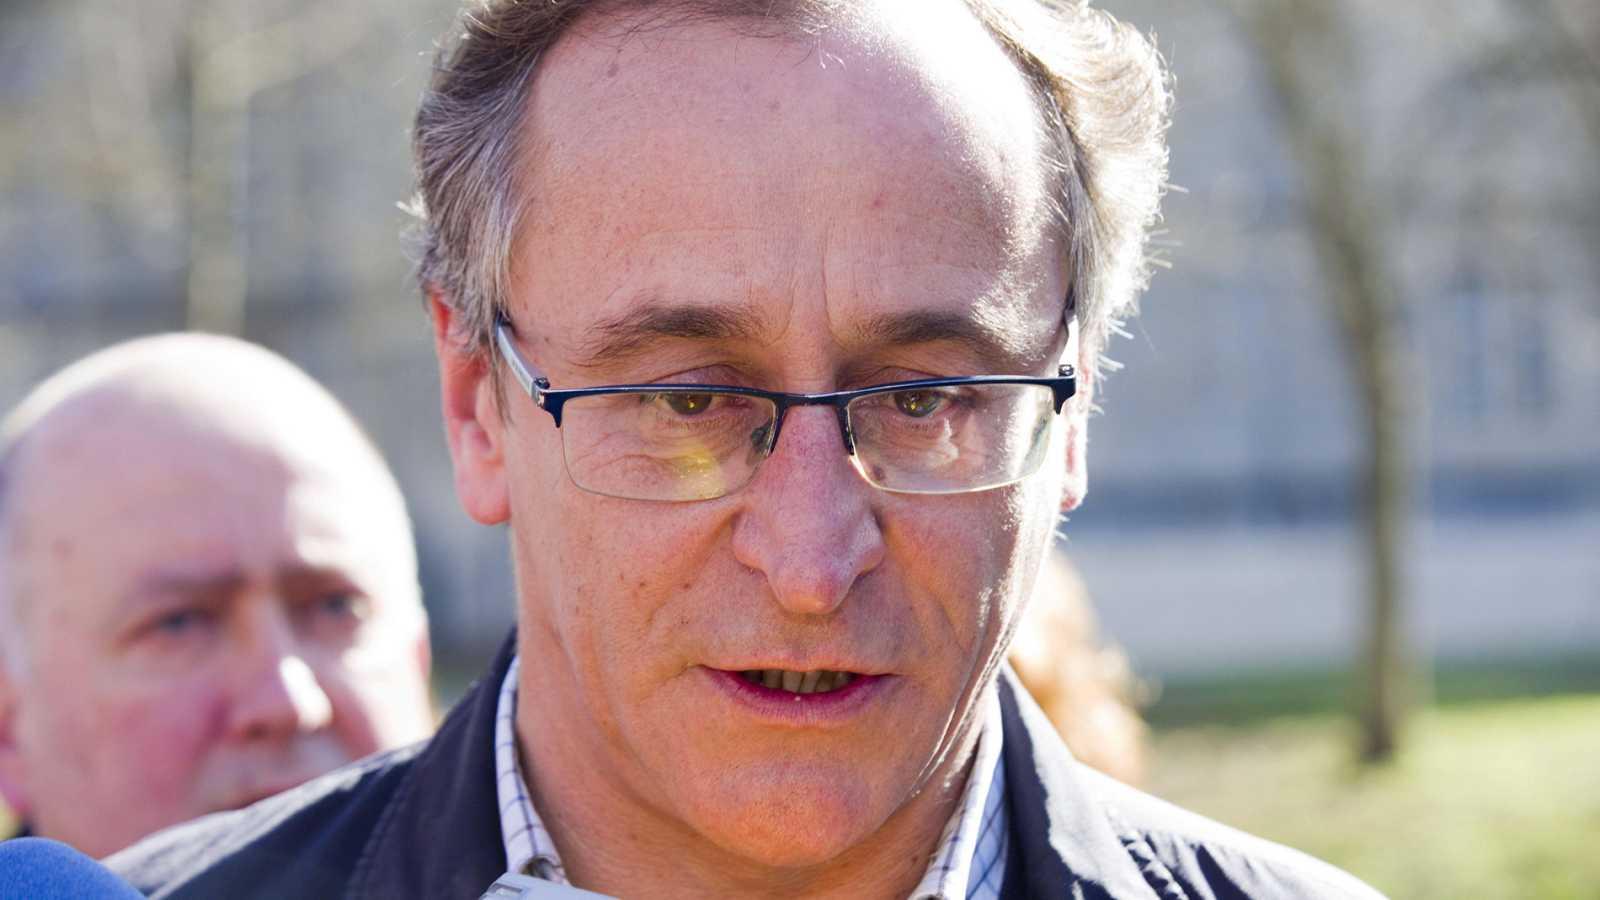 ¿Mantendrá el PP a Alfonso Alonso como candidato a lehendakari?